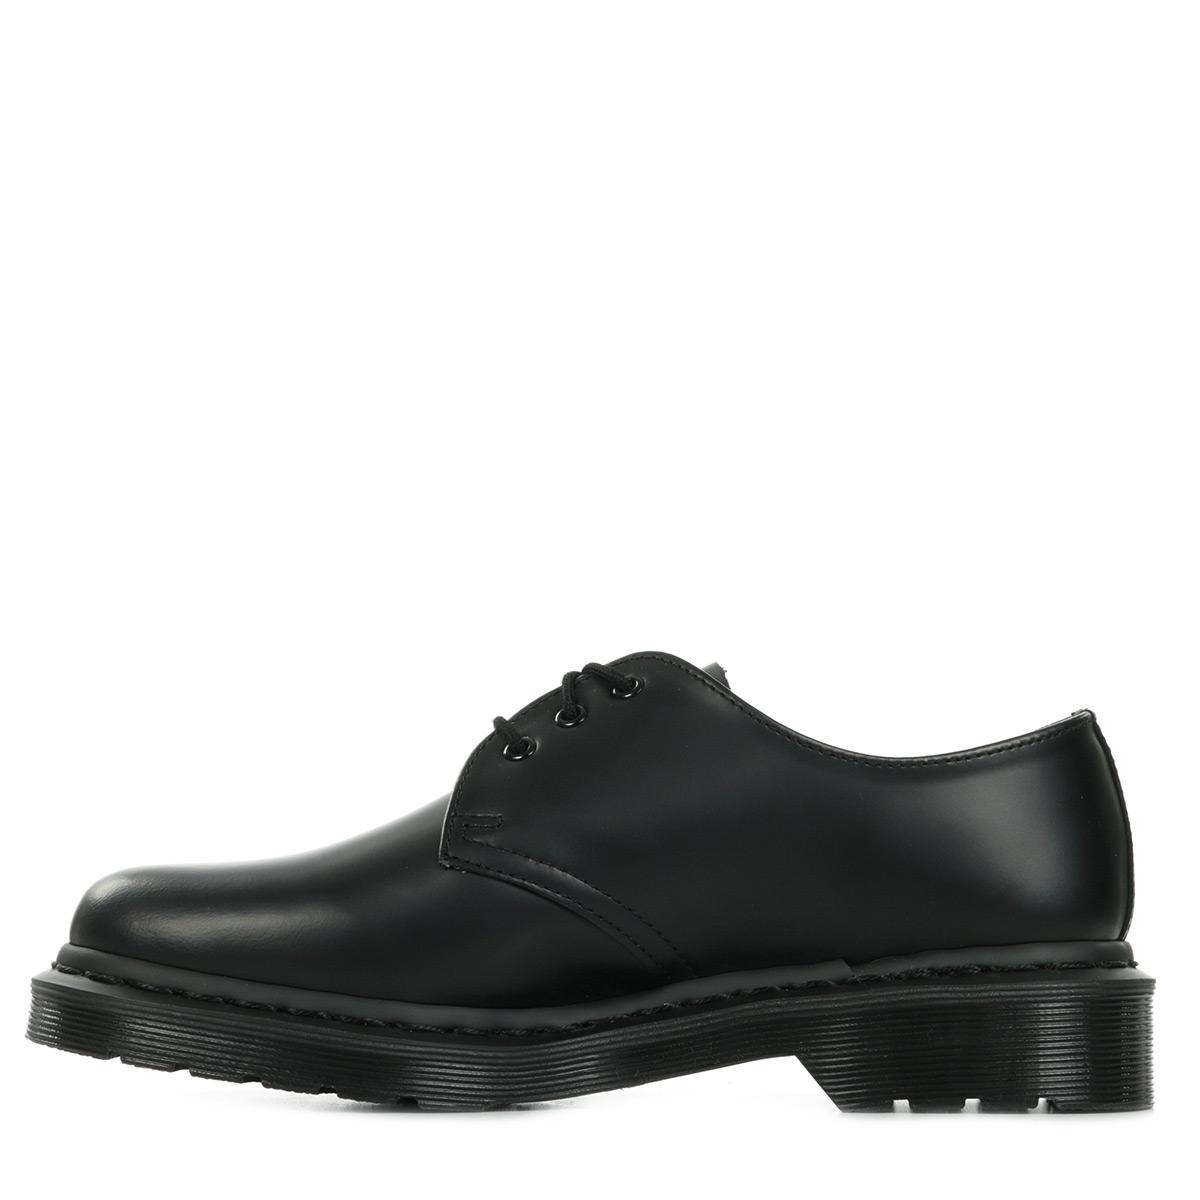 Dr. Martens 1461 Mono Black Smooth 14345001, Ville